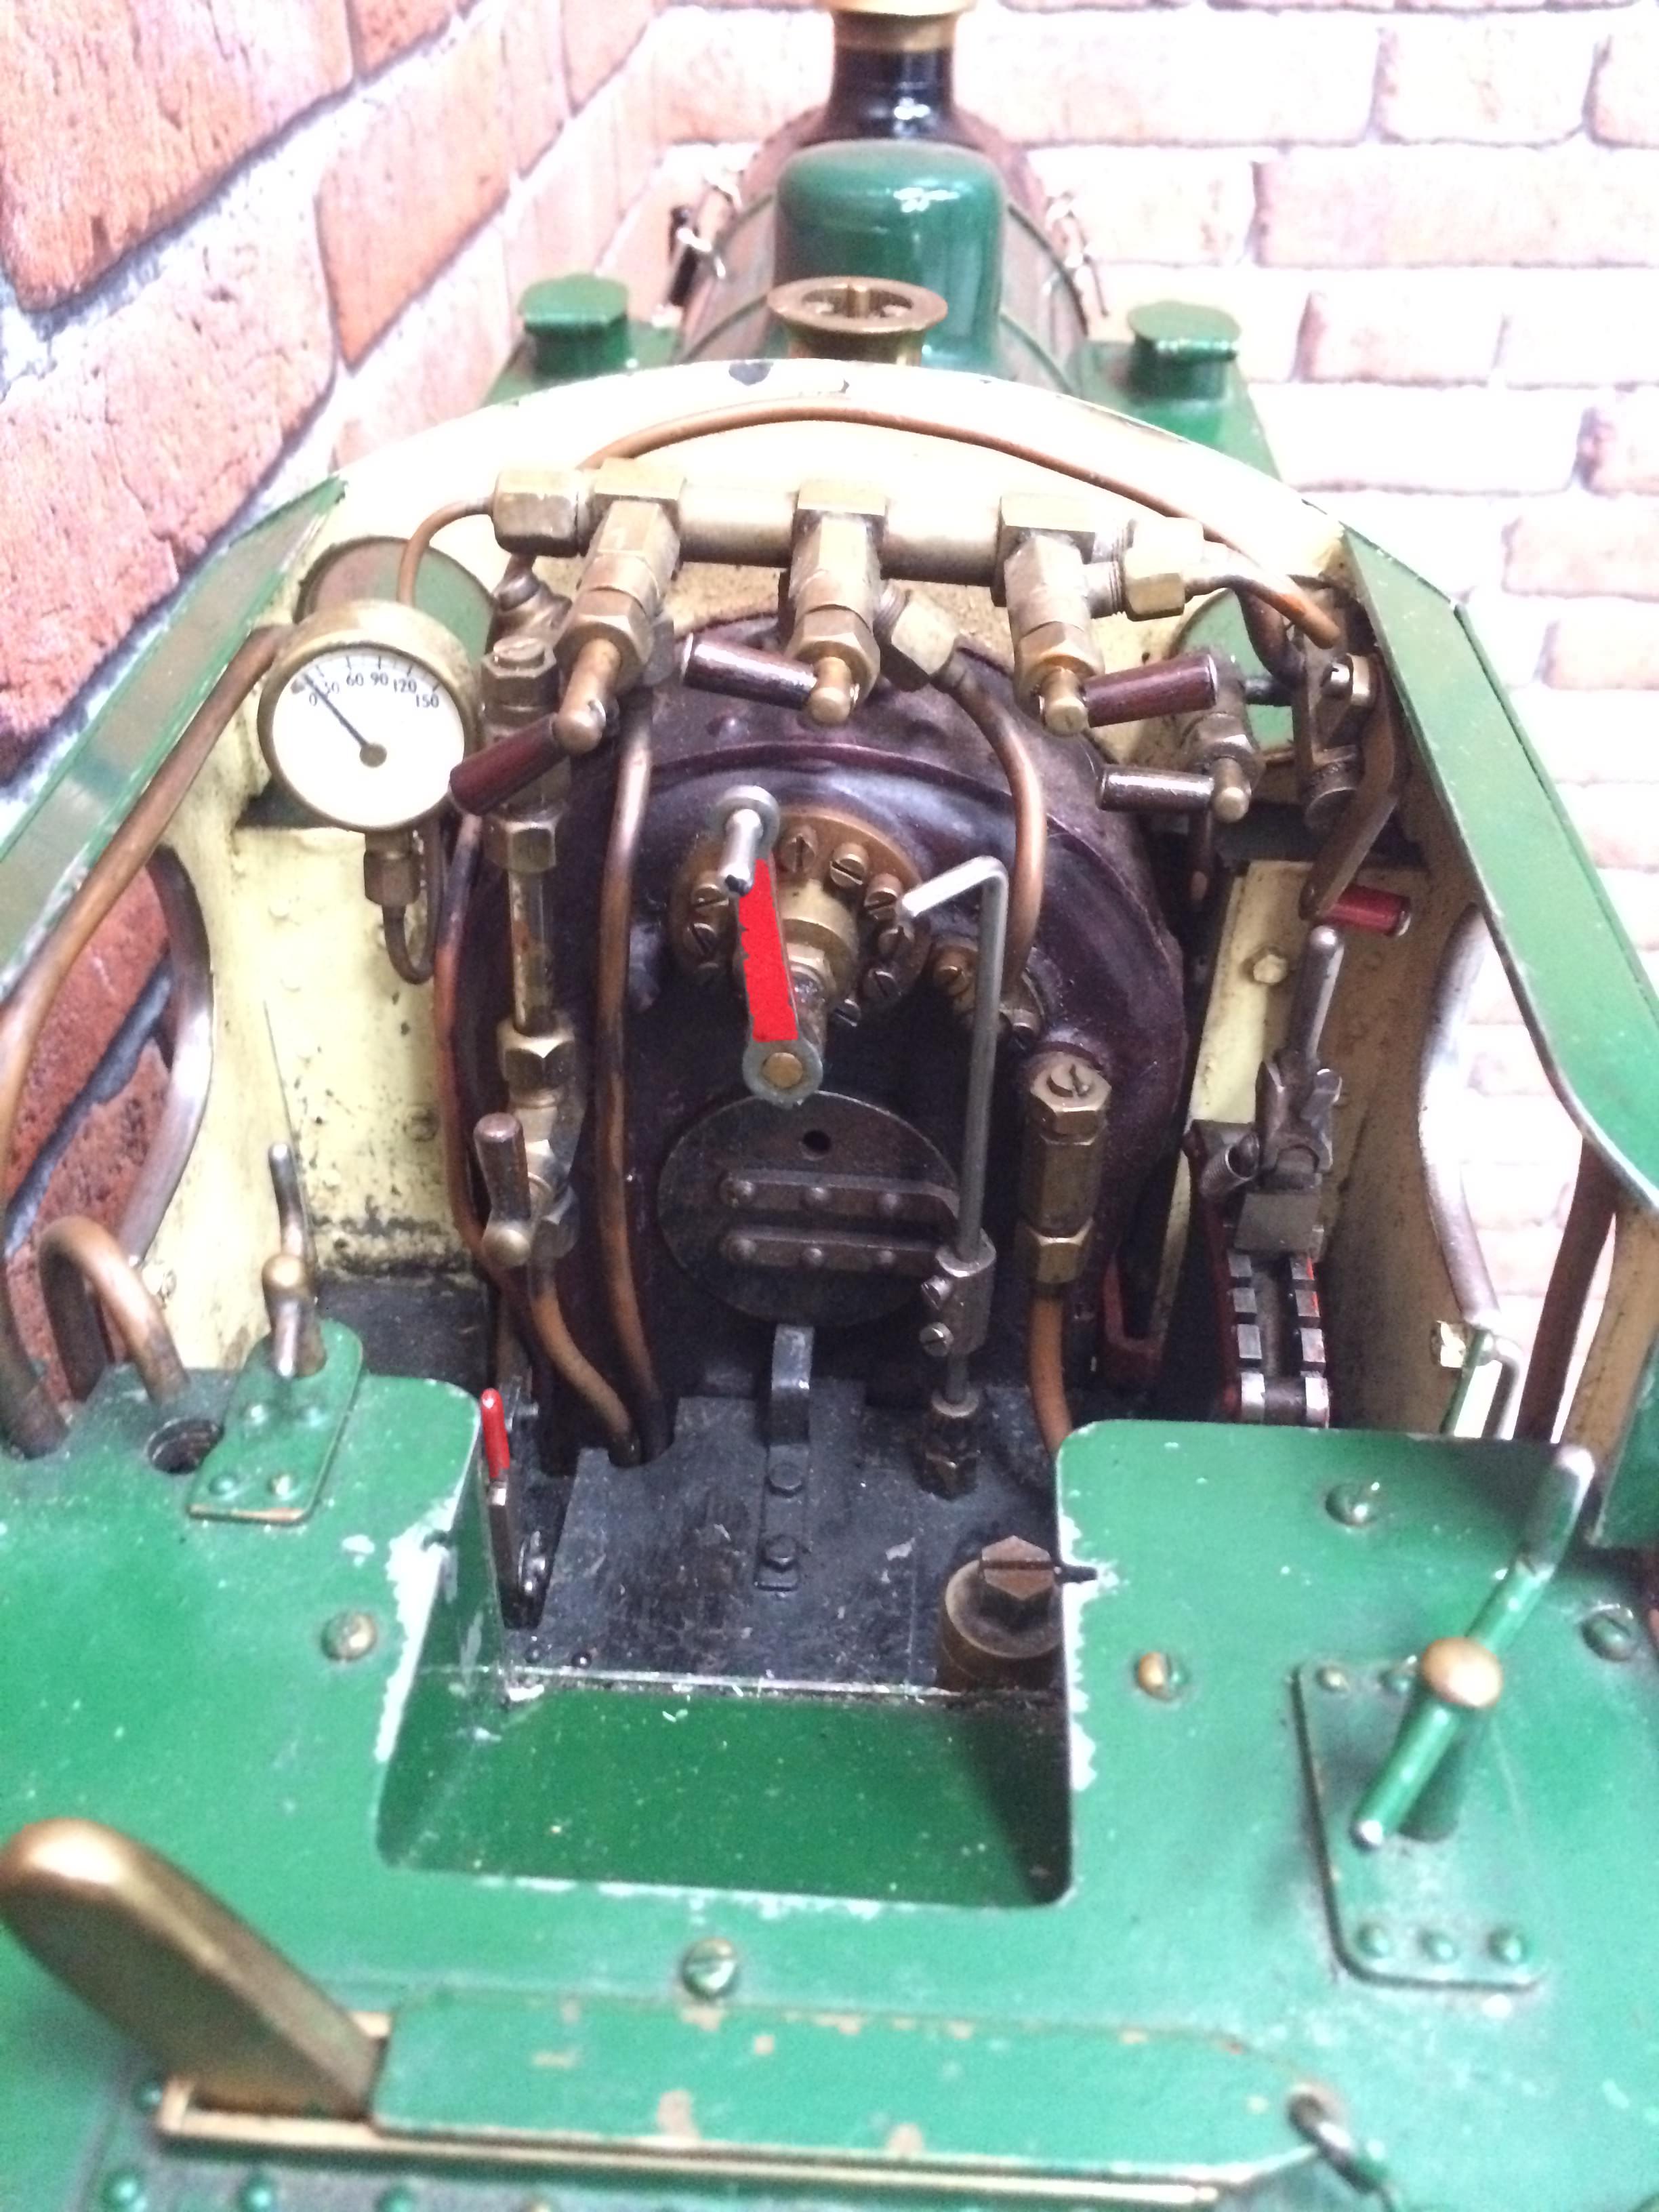 test 3 inch gauge freelance live steam tank engine for sale 16